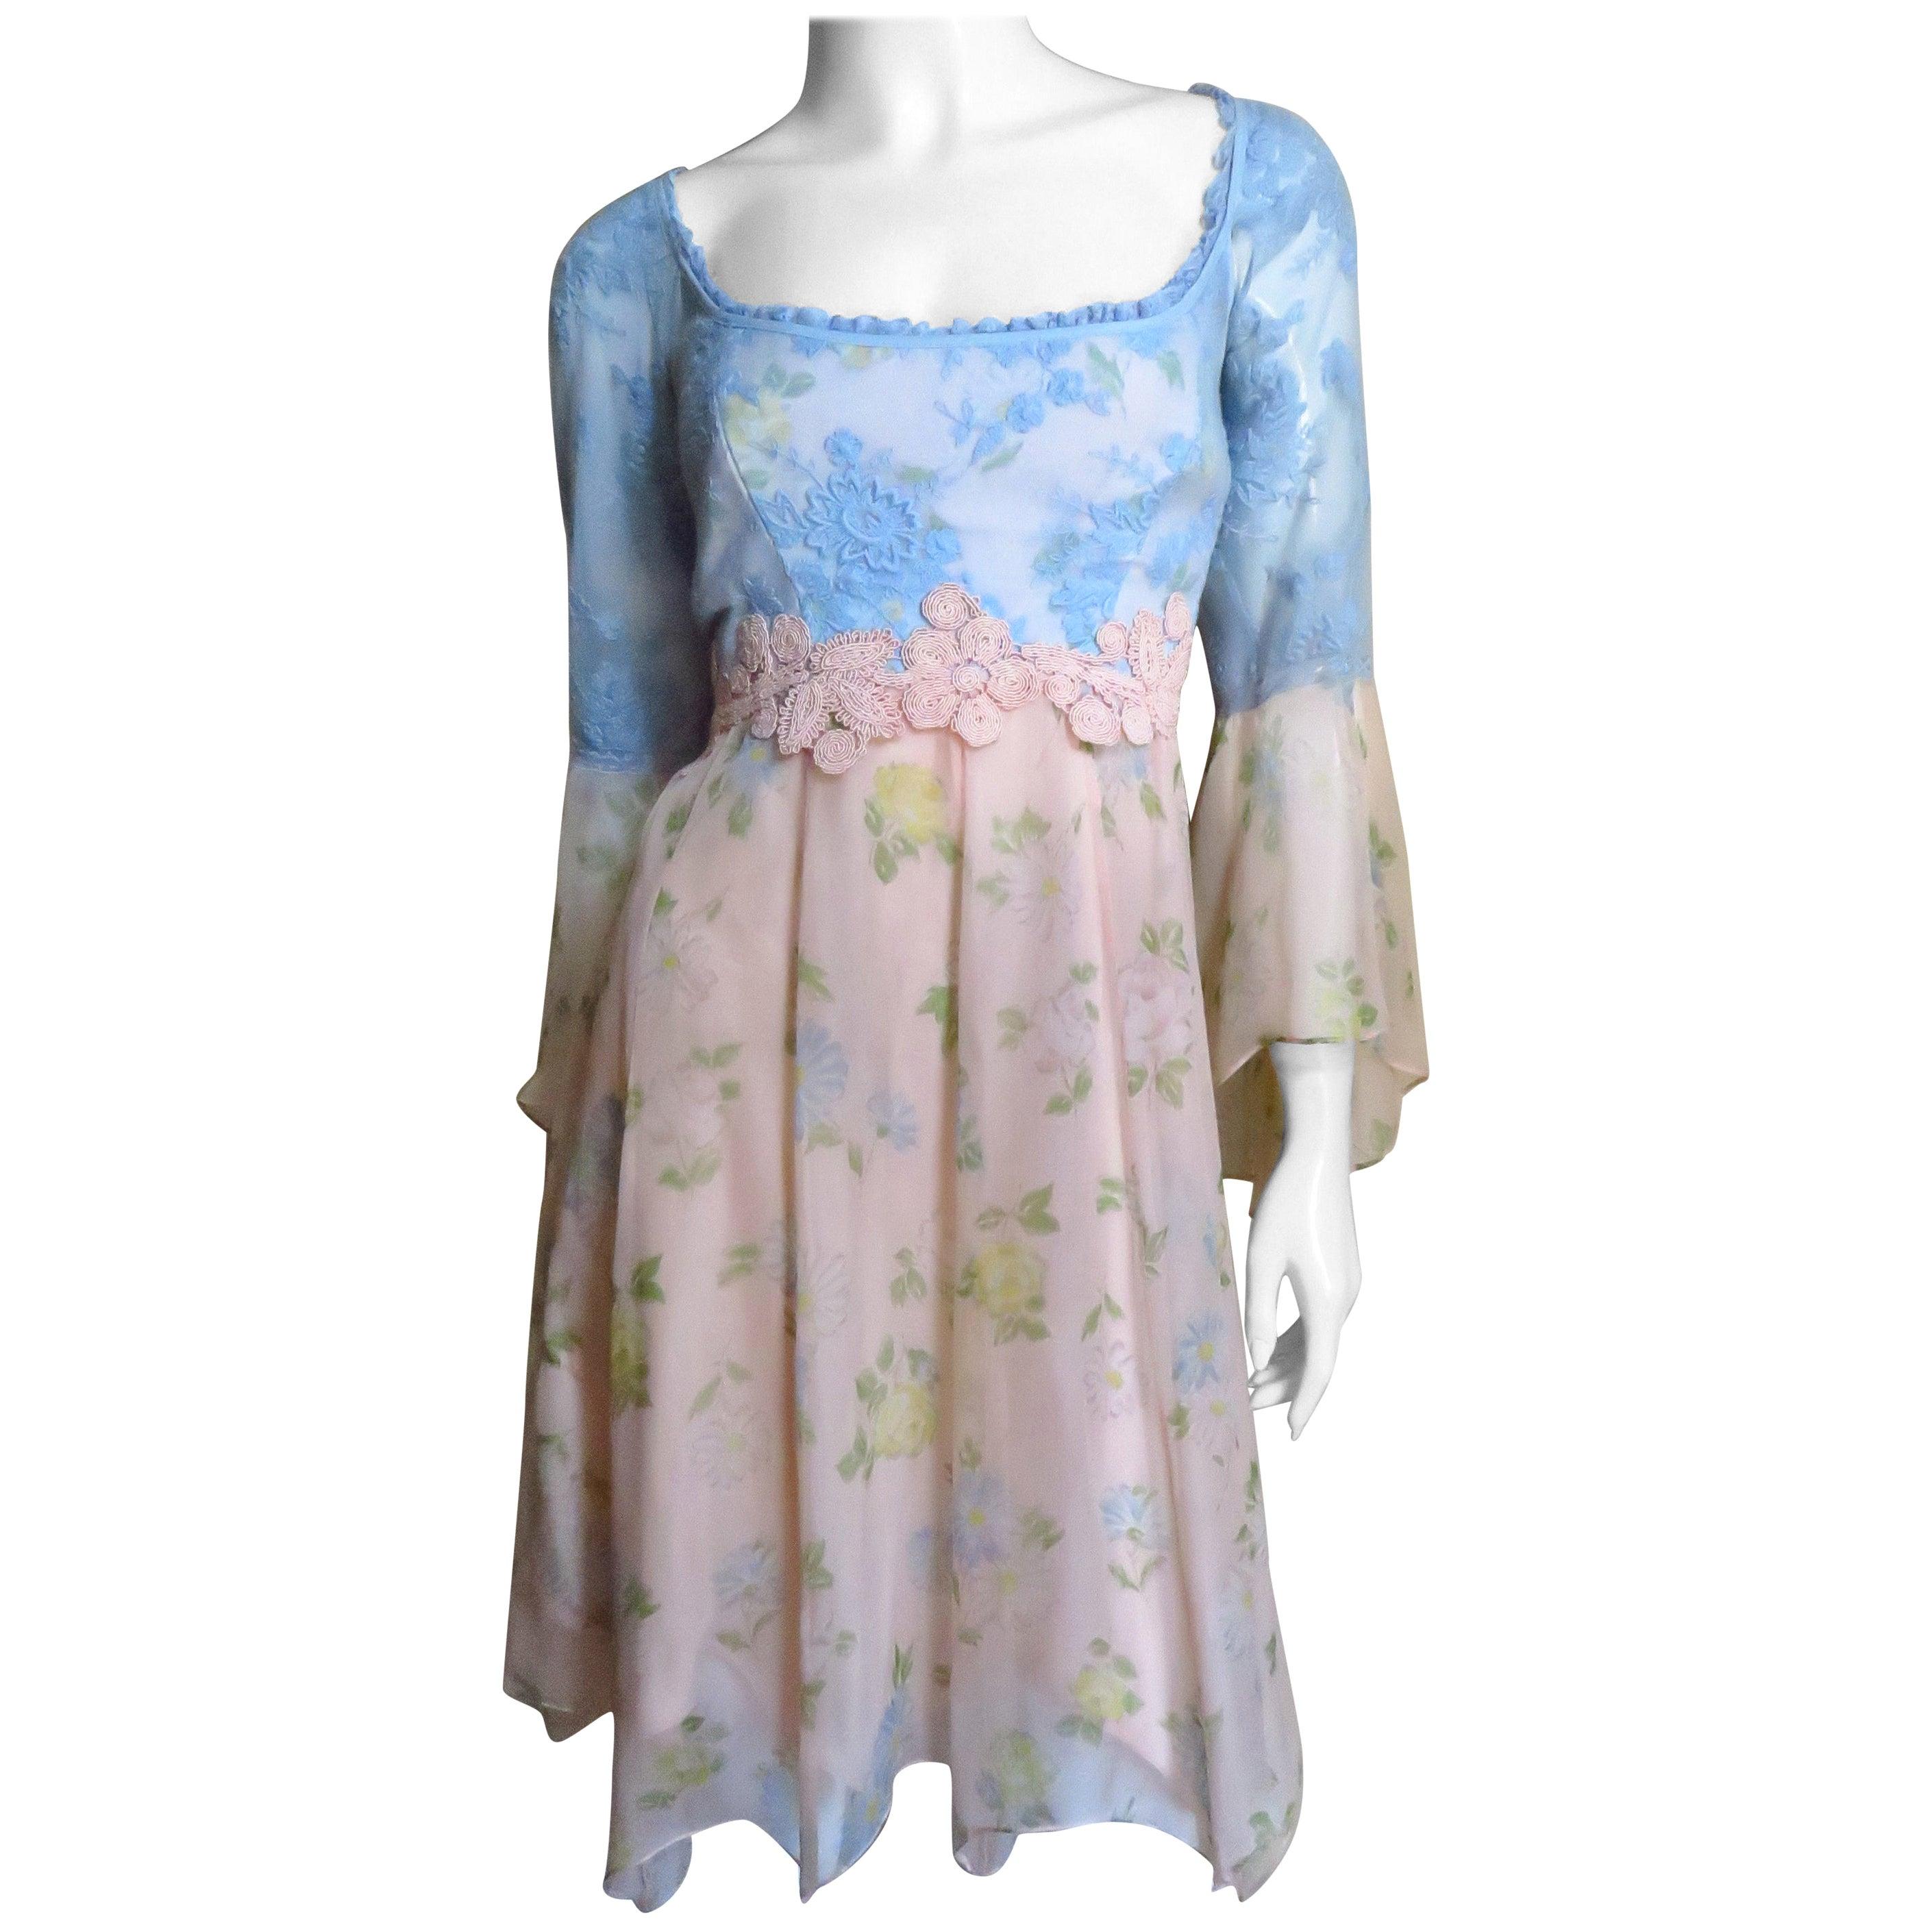 Lolita Lempicka Silk Dress with Lace